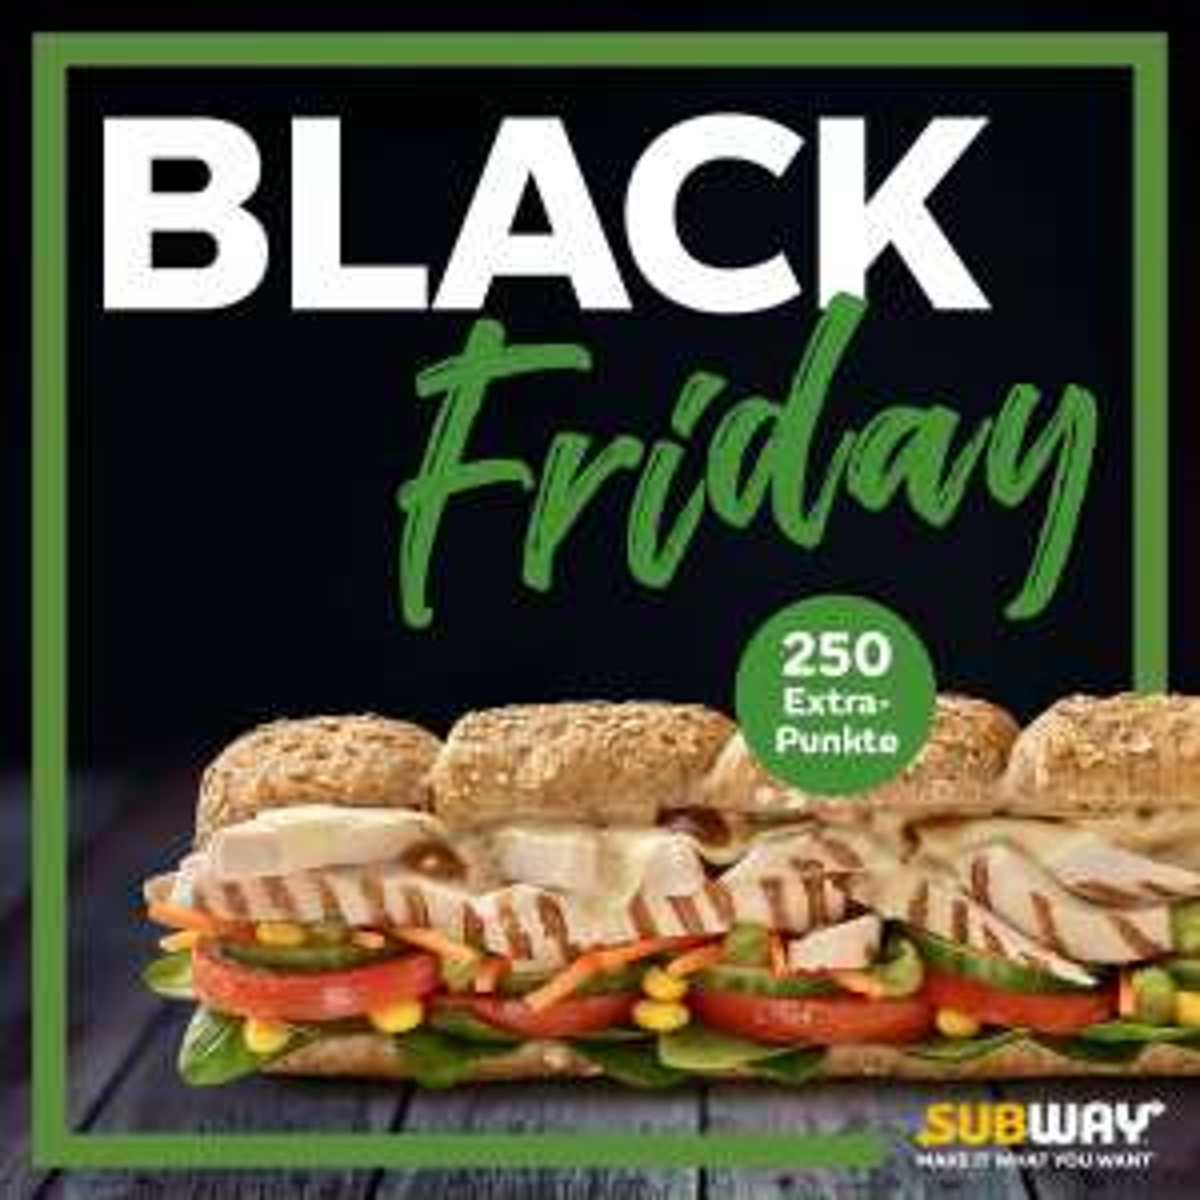 [Subway] 250 Extra Punkte (Black Friday)